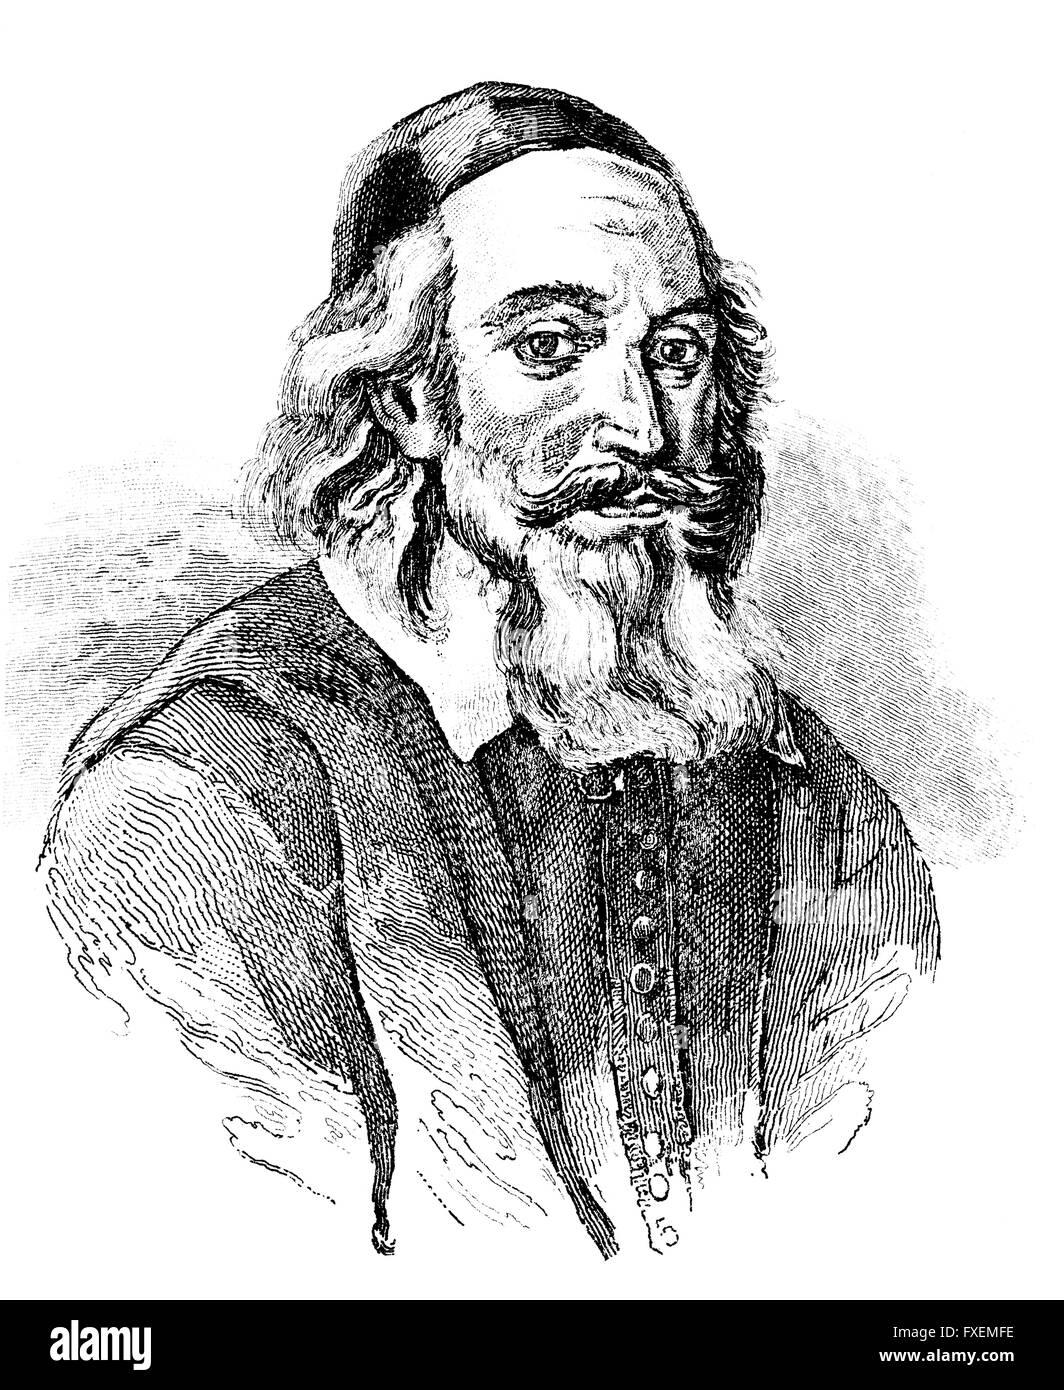 Axel Gustafsson Oxenstierna af Södermöre, 1583-1654, Count of Södermöre, a Swedish statesman, Graf Axel Gustafsson Stock Photo